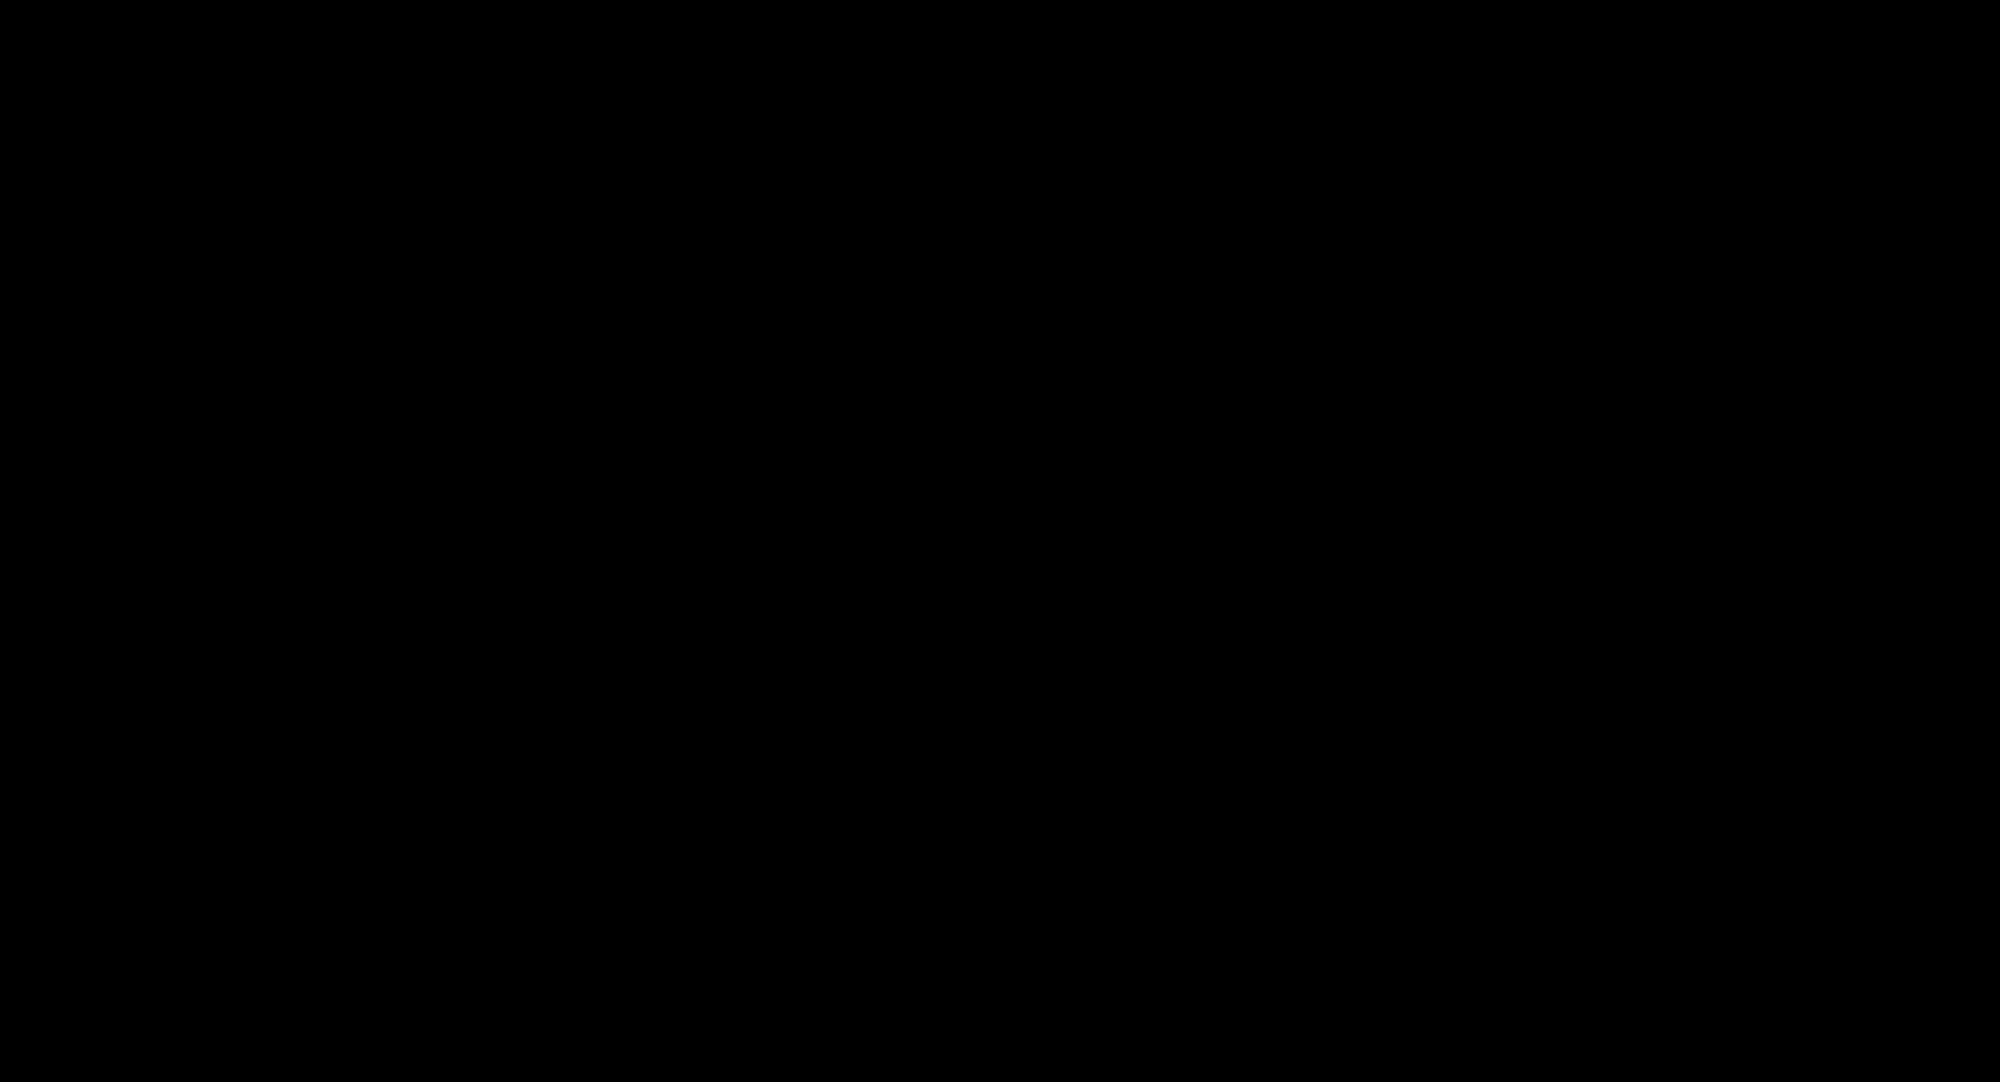 StratSpace-logo-black.png